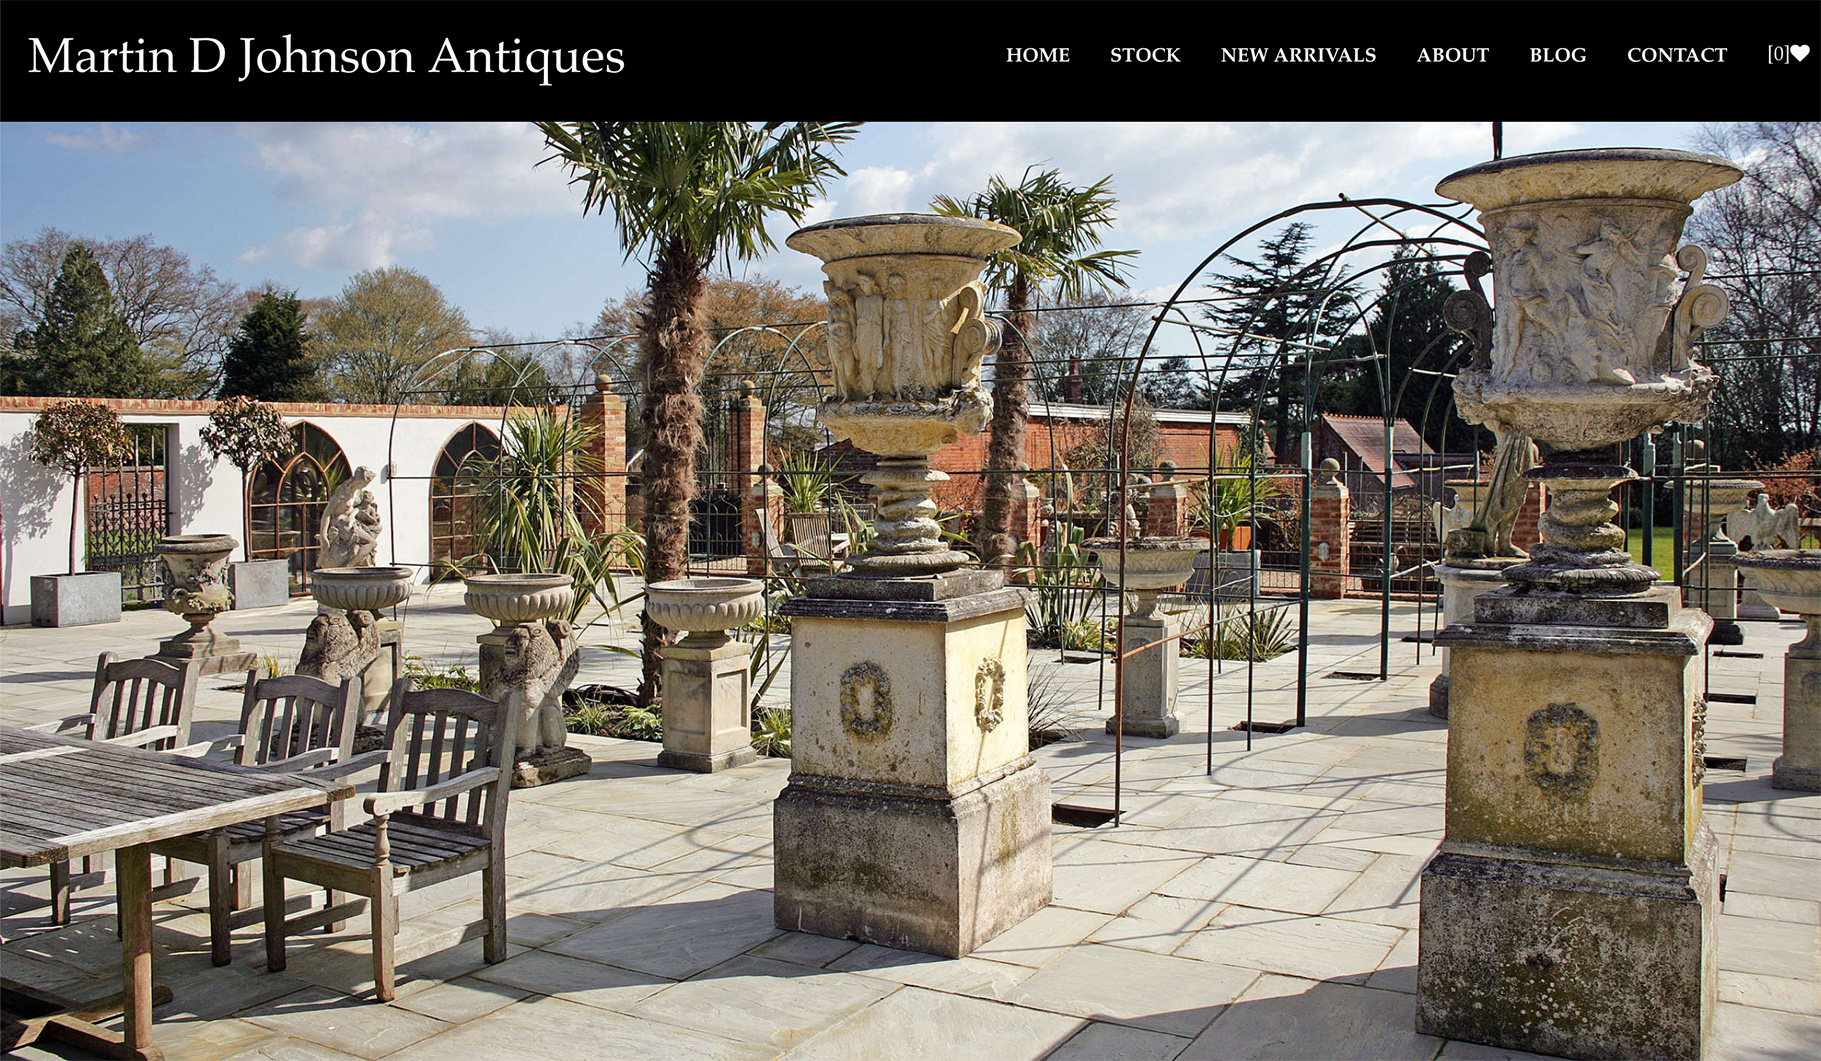 New sites using Carsington theme